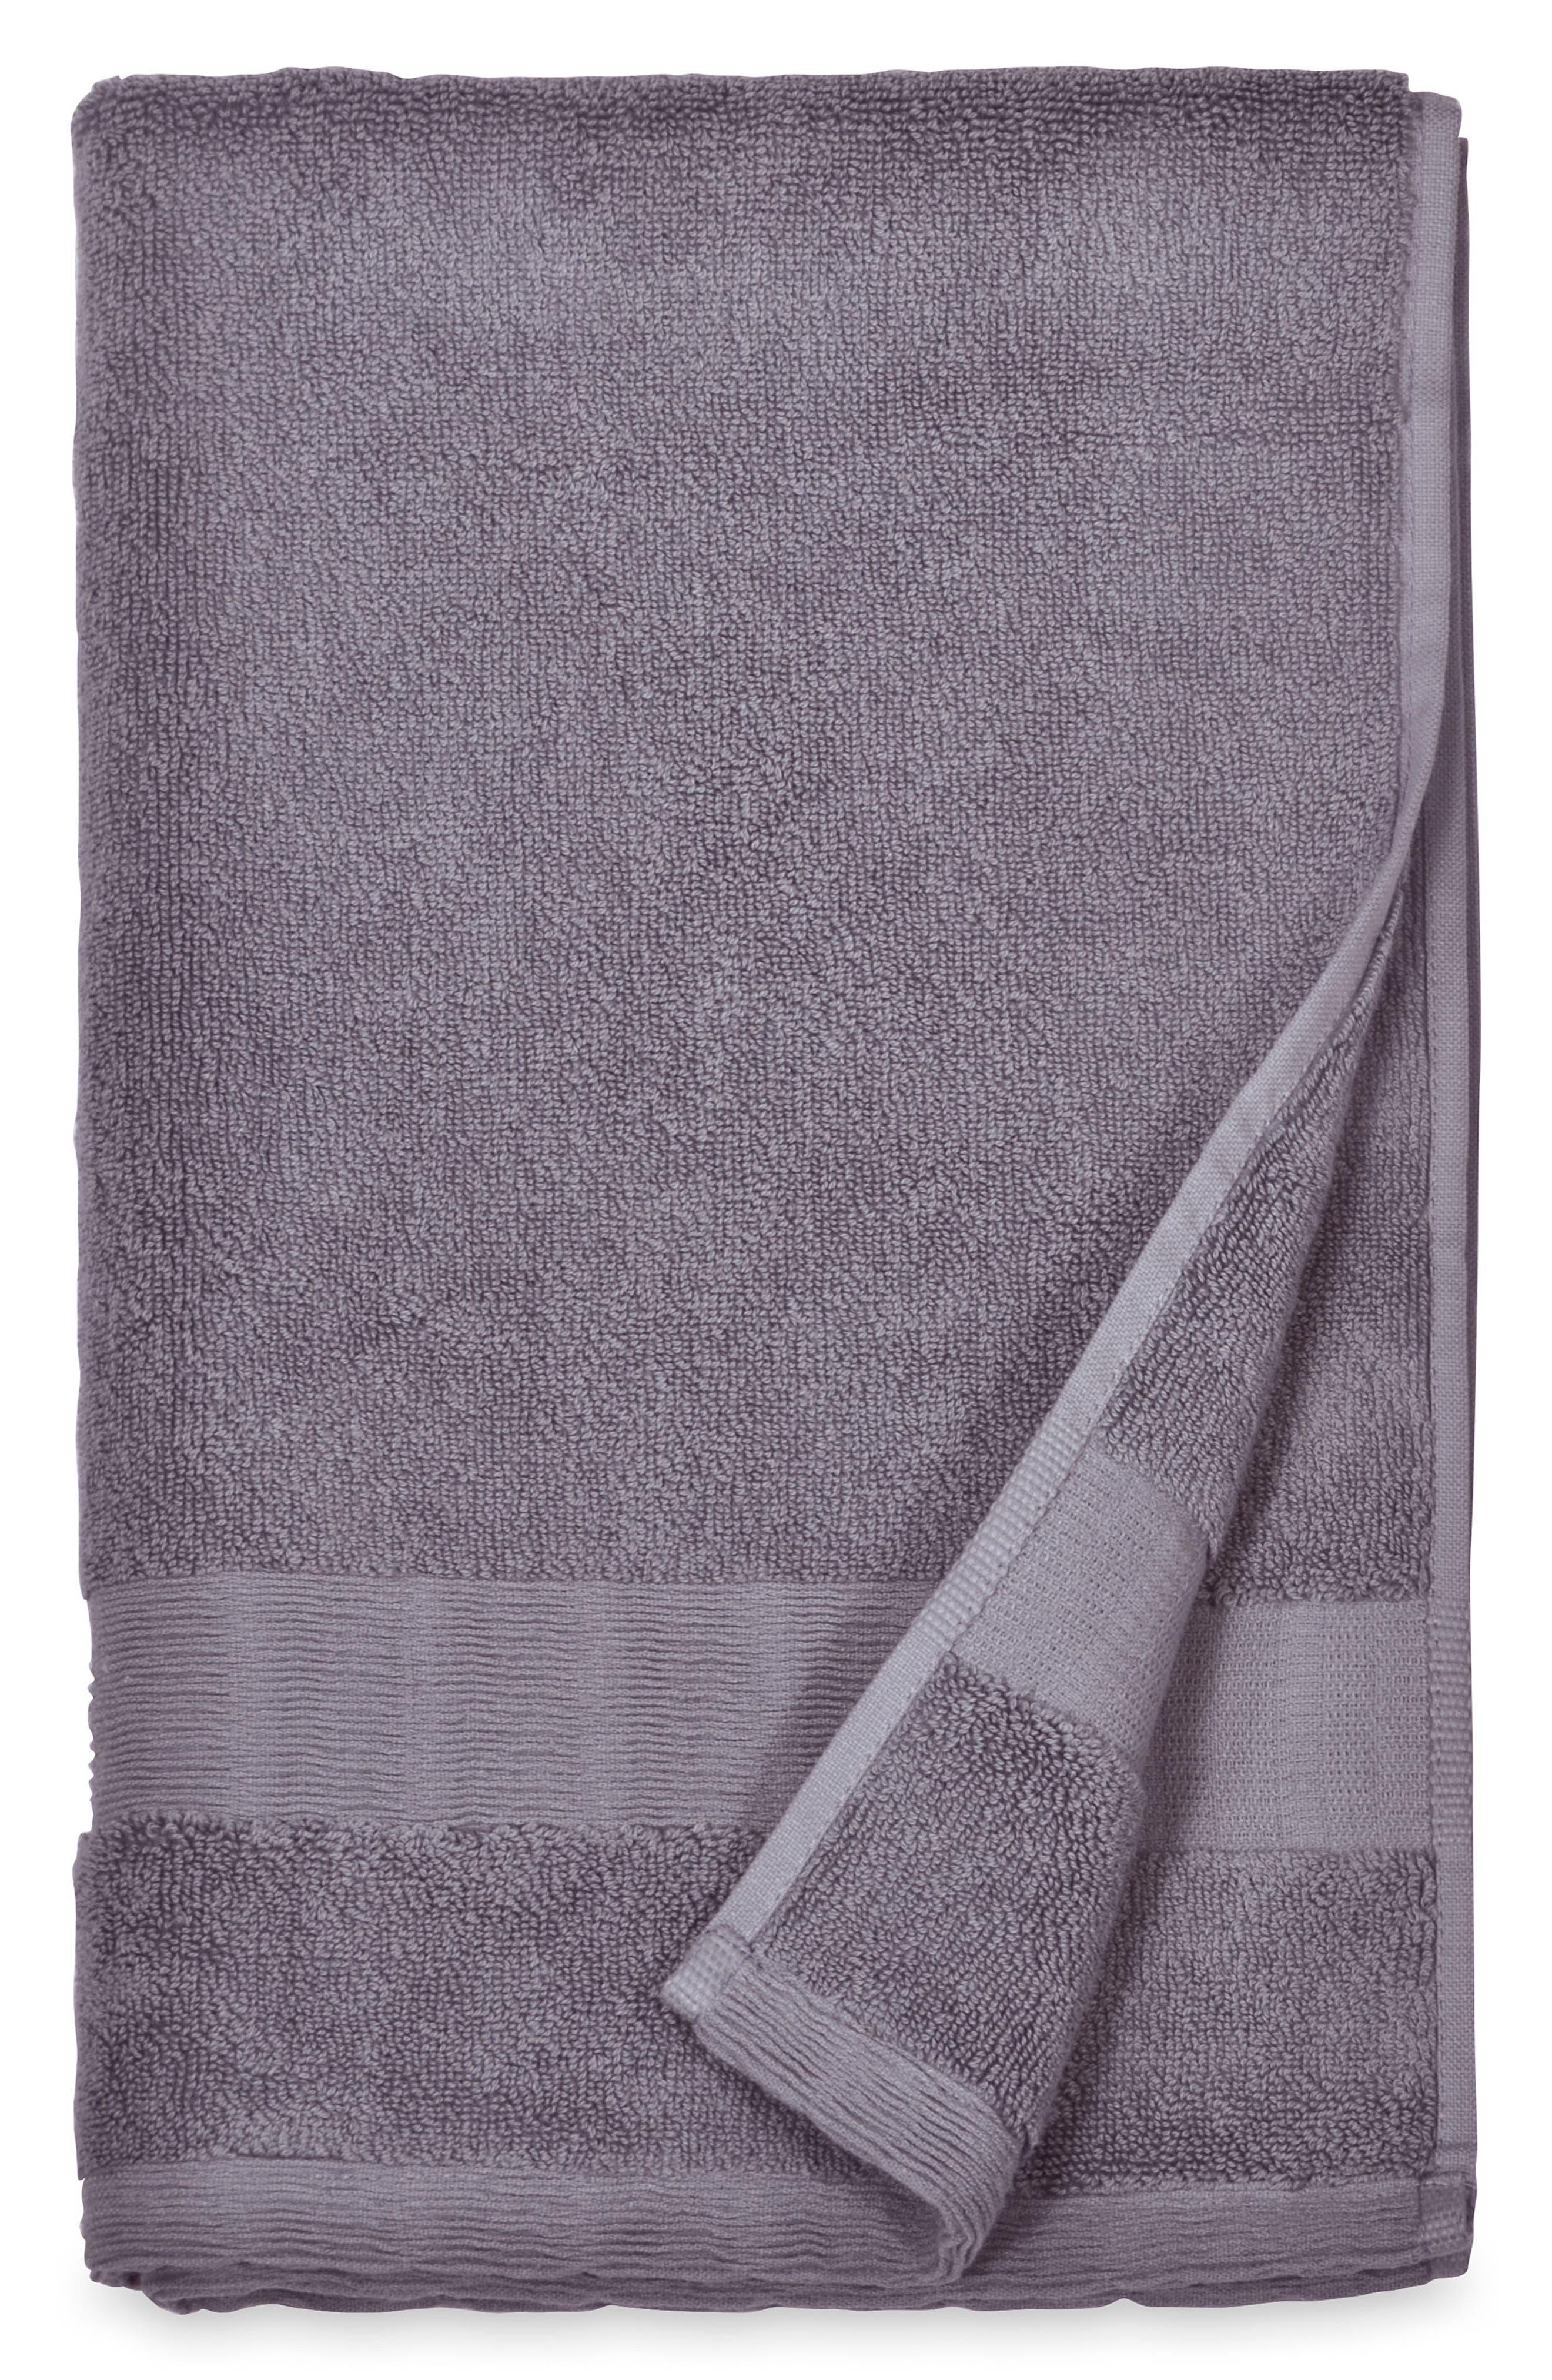 Mercer Hand Towel,                         Main,                         color, Dusty Lavender